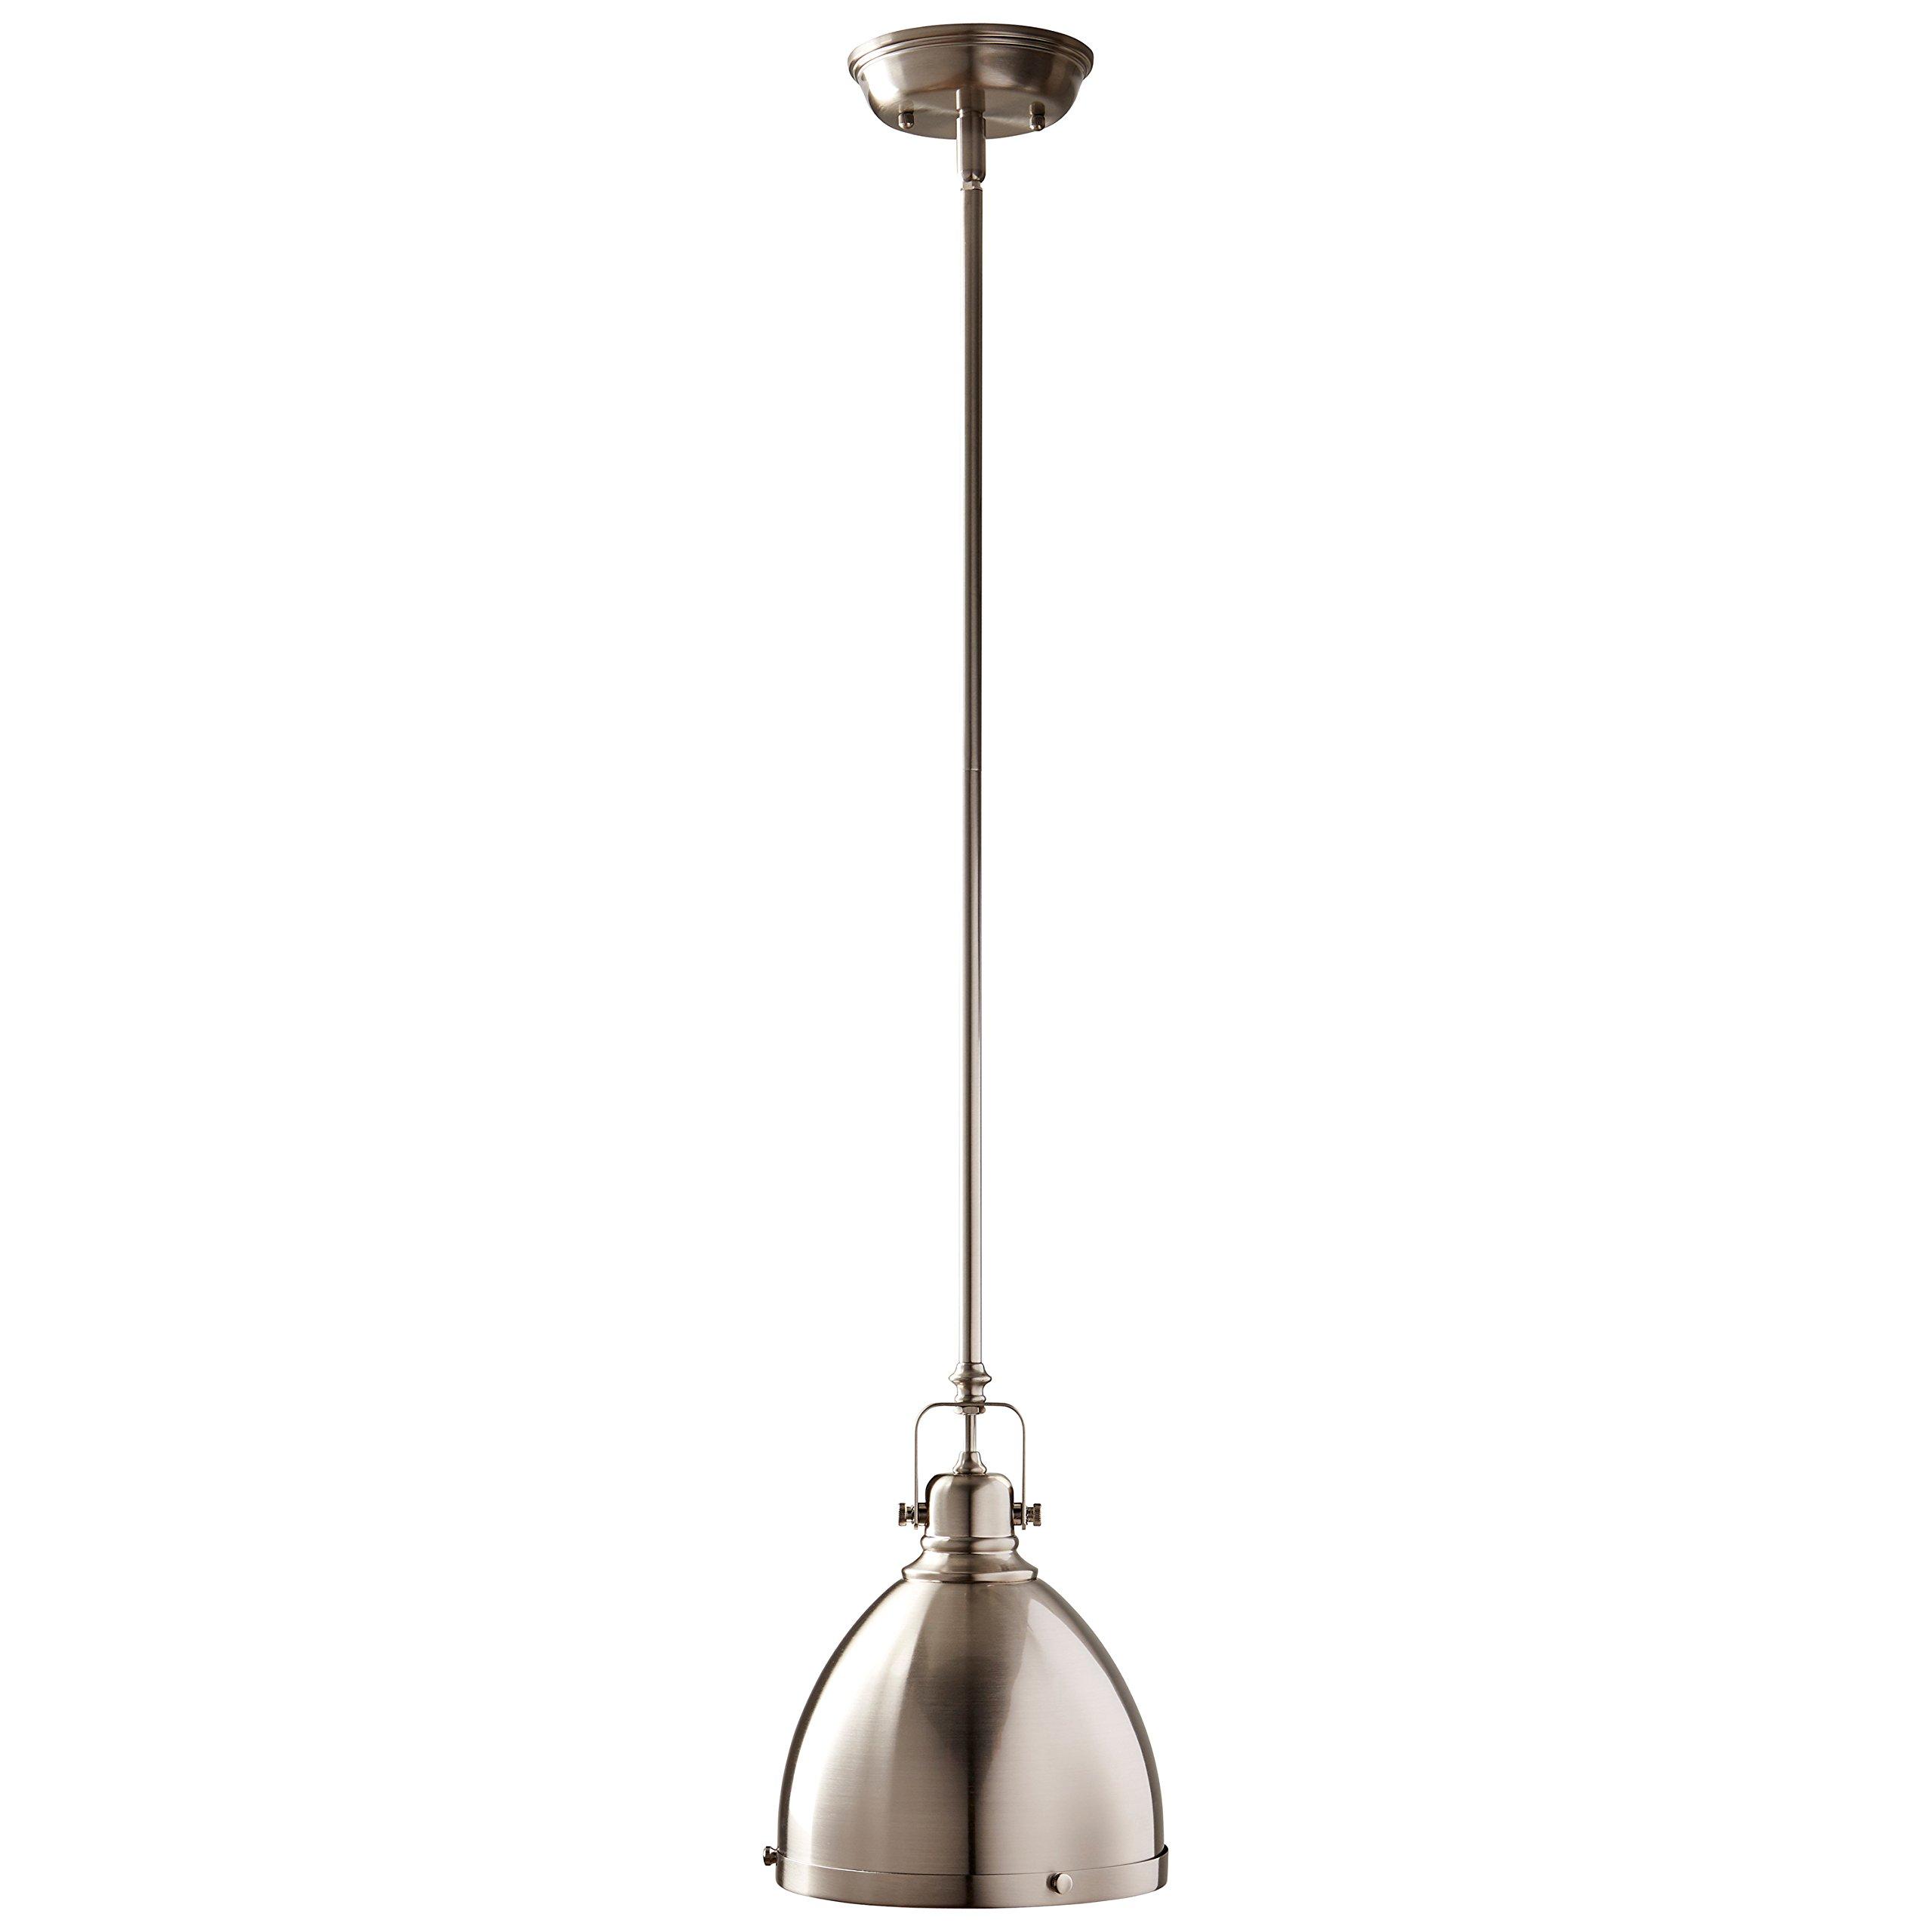 Stone & Beam Hood Pendant Light, 13''-61''H, Brushed Nickel